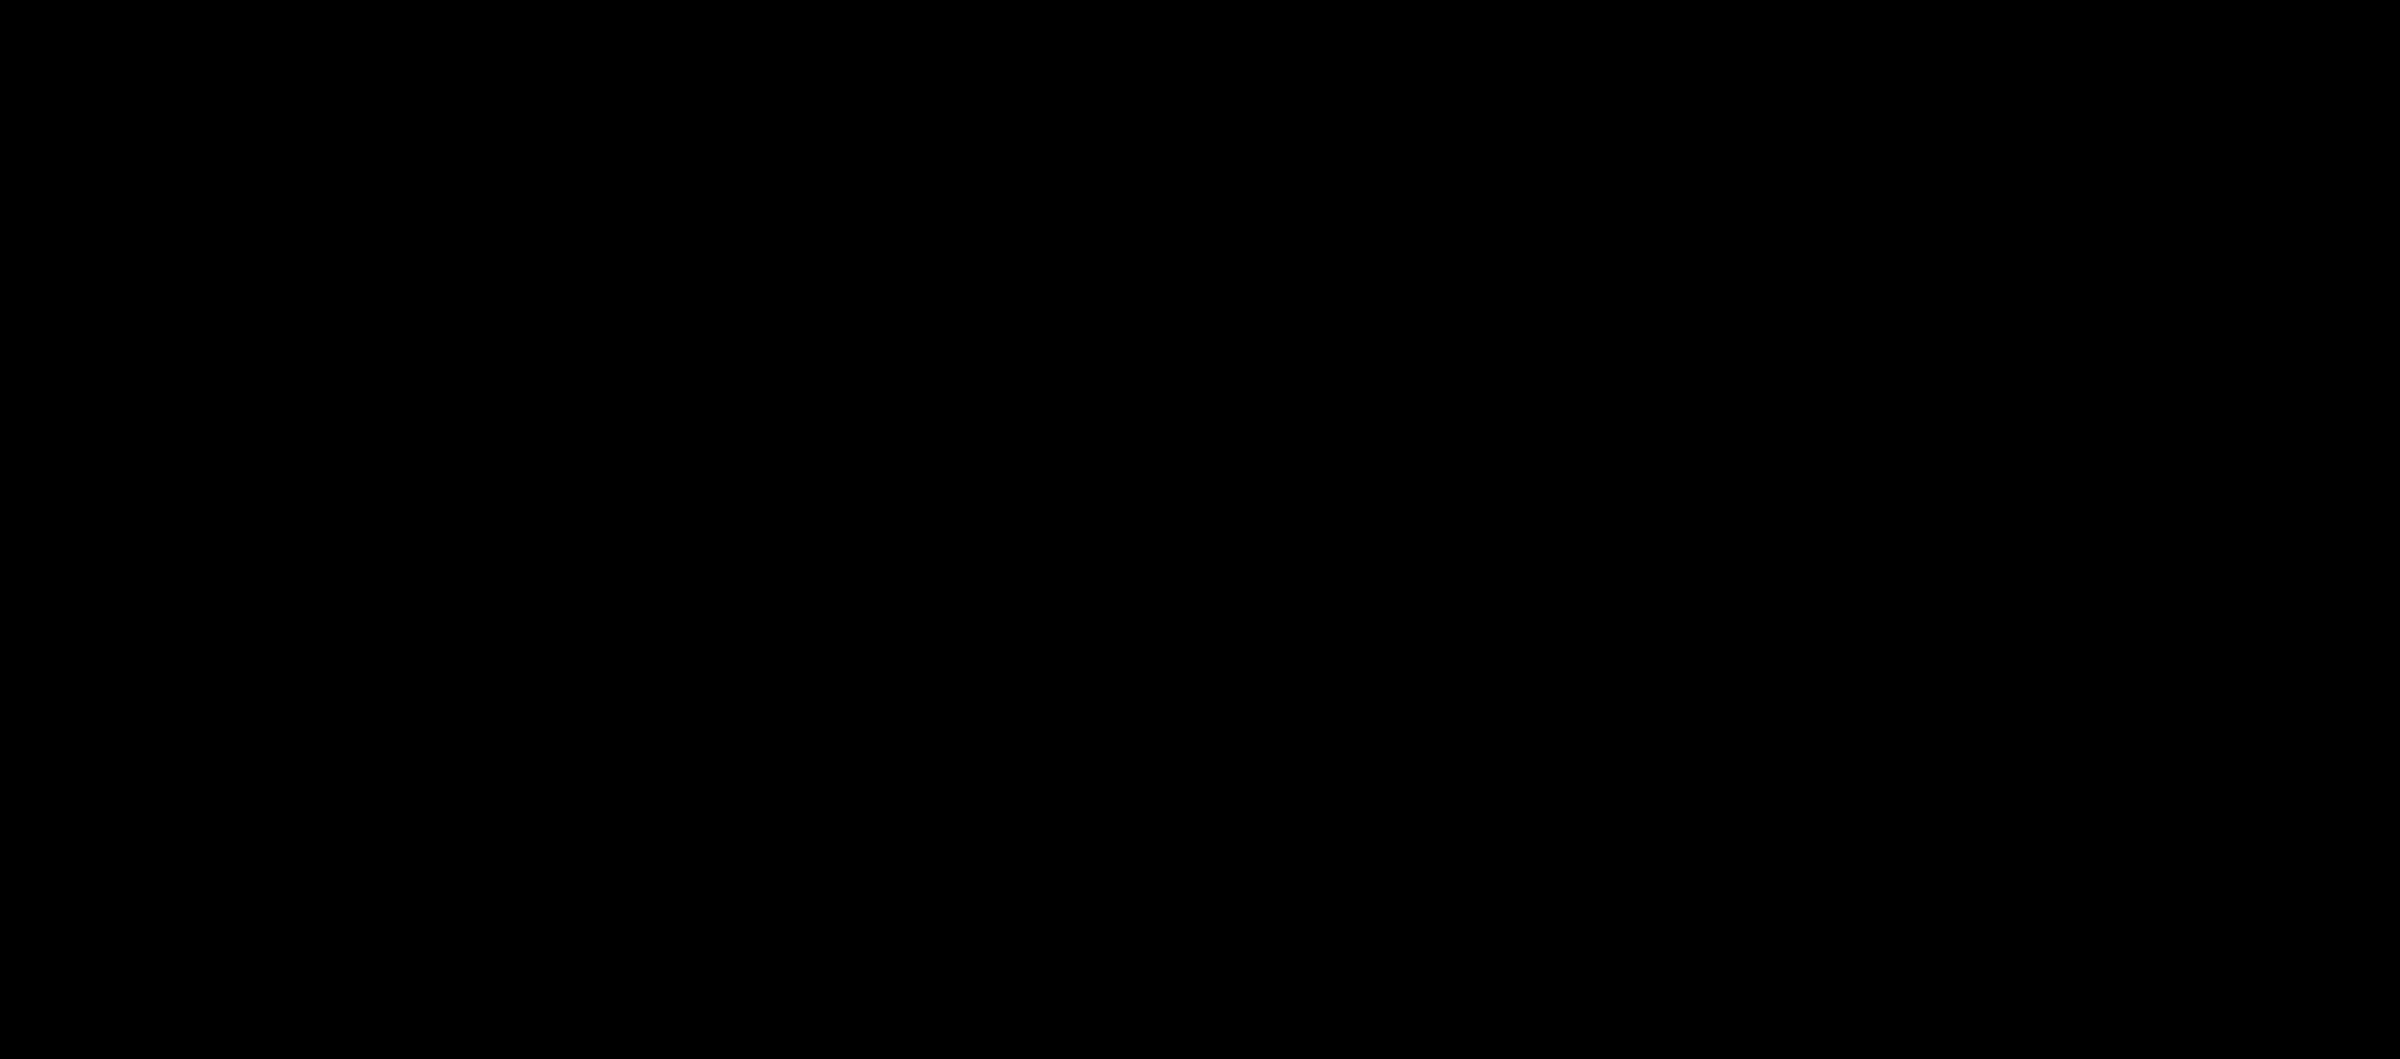 ELAC Logo PNG Transparent & SVG Vector - Freebie Supply